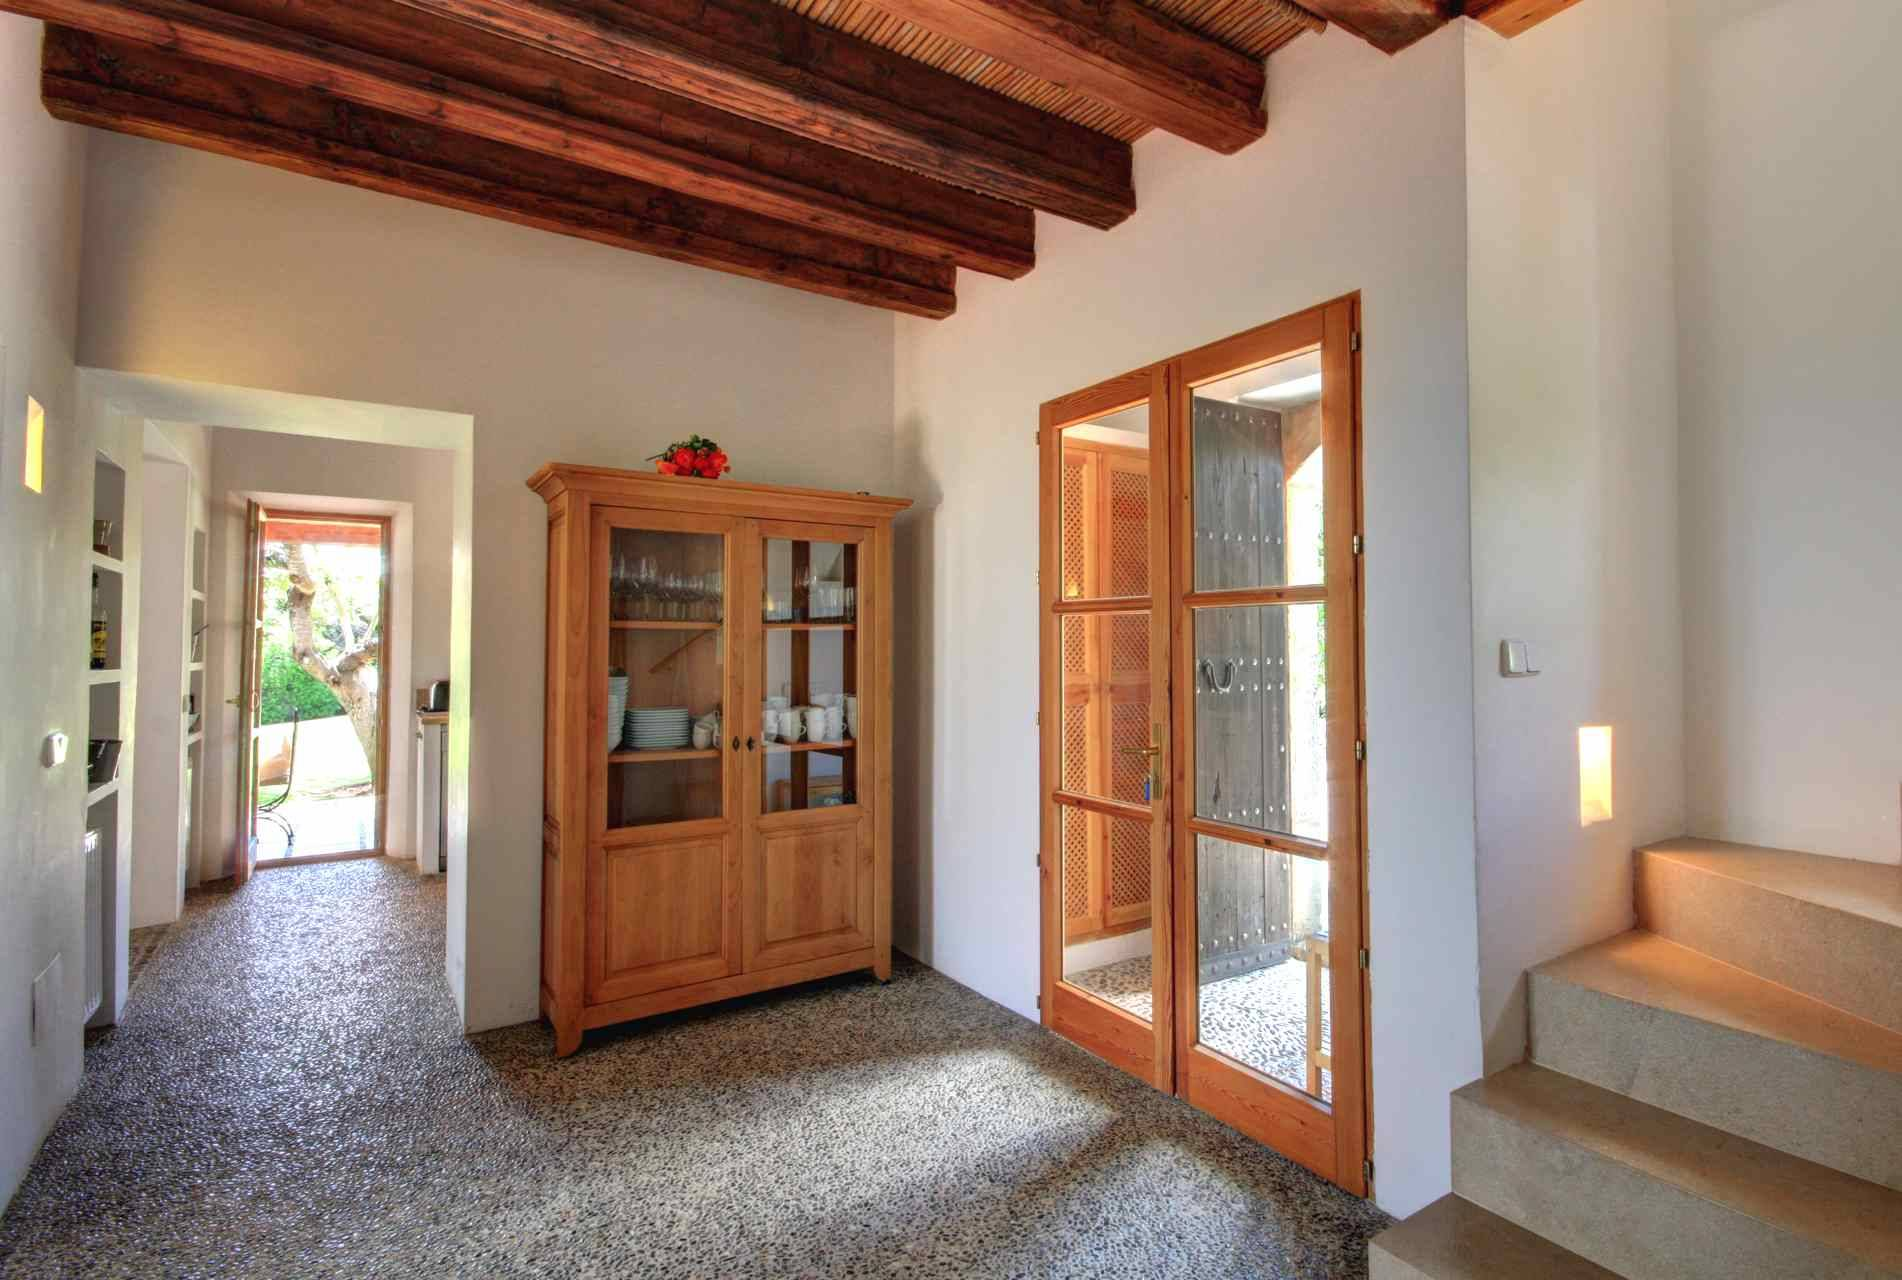 01-51 Authentic Finca Mallorca Northeast Bild 13